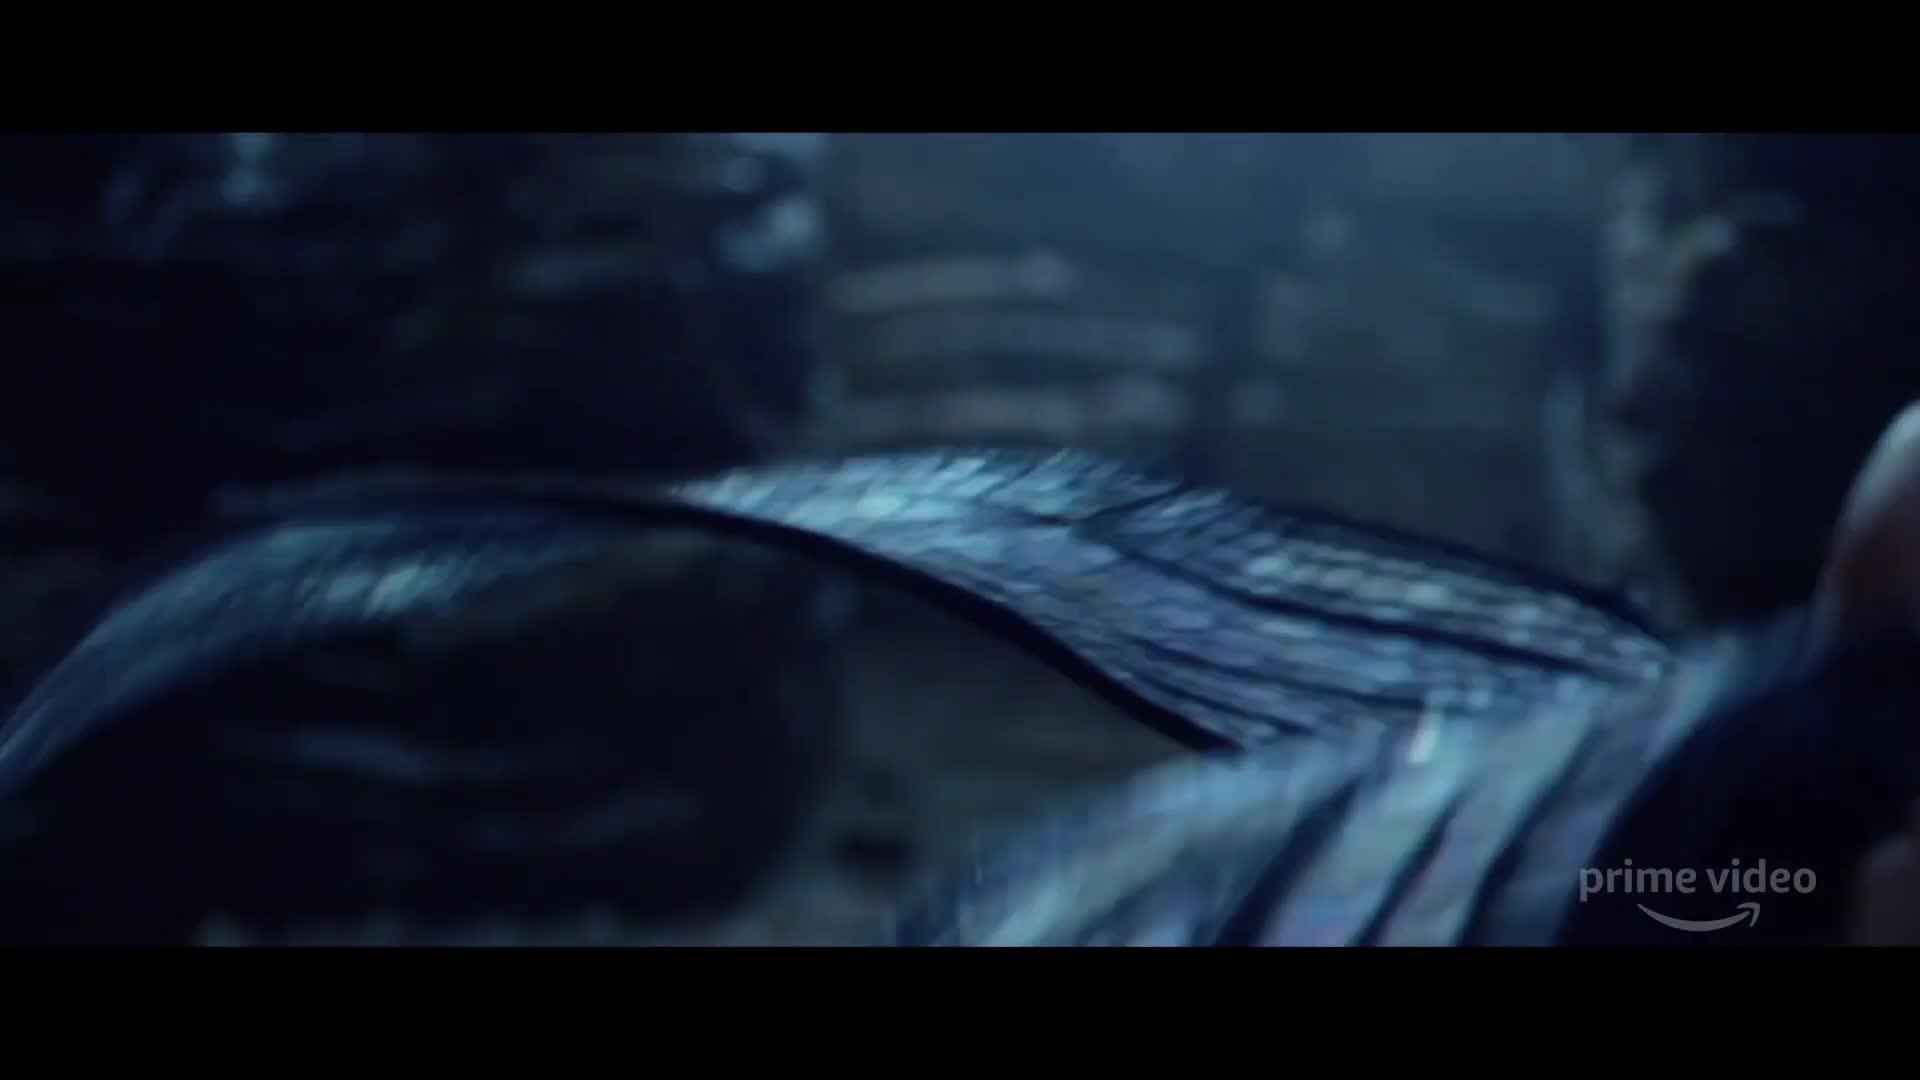 Carnival Row (Season 1) - Official Trailer [HD] screen capture